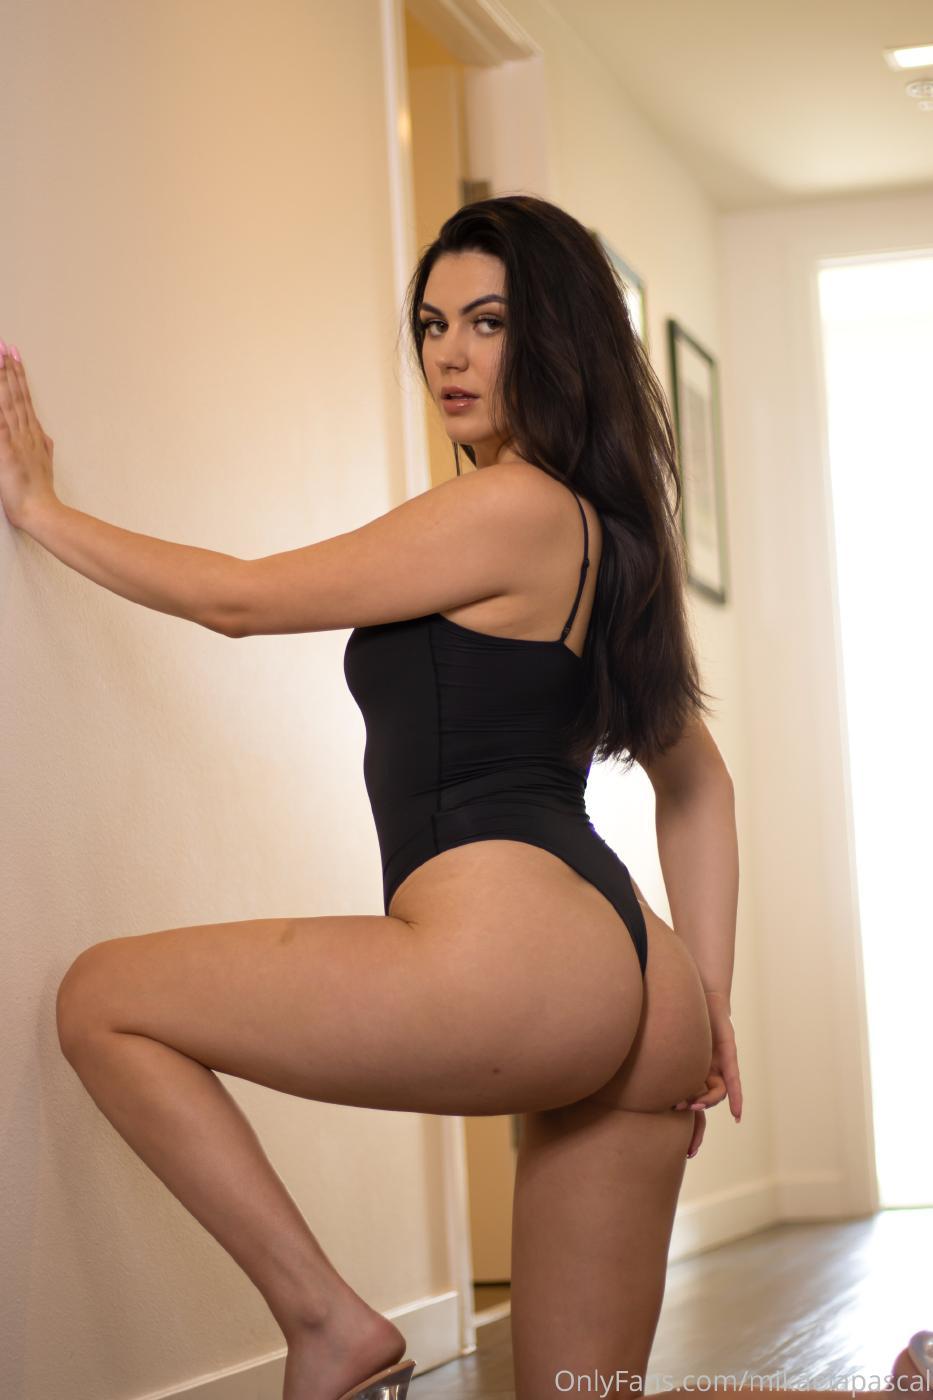 Mikaela Pascal Topless Bodysuit Onlyfans Set Leaked Jxblhm